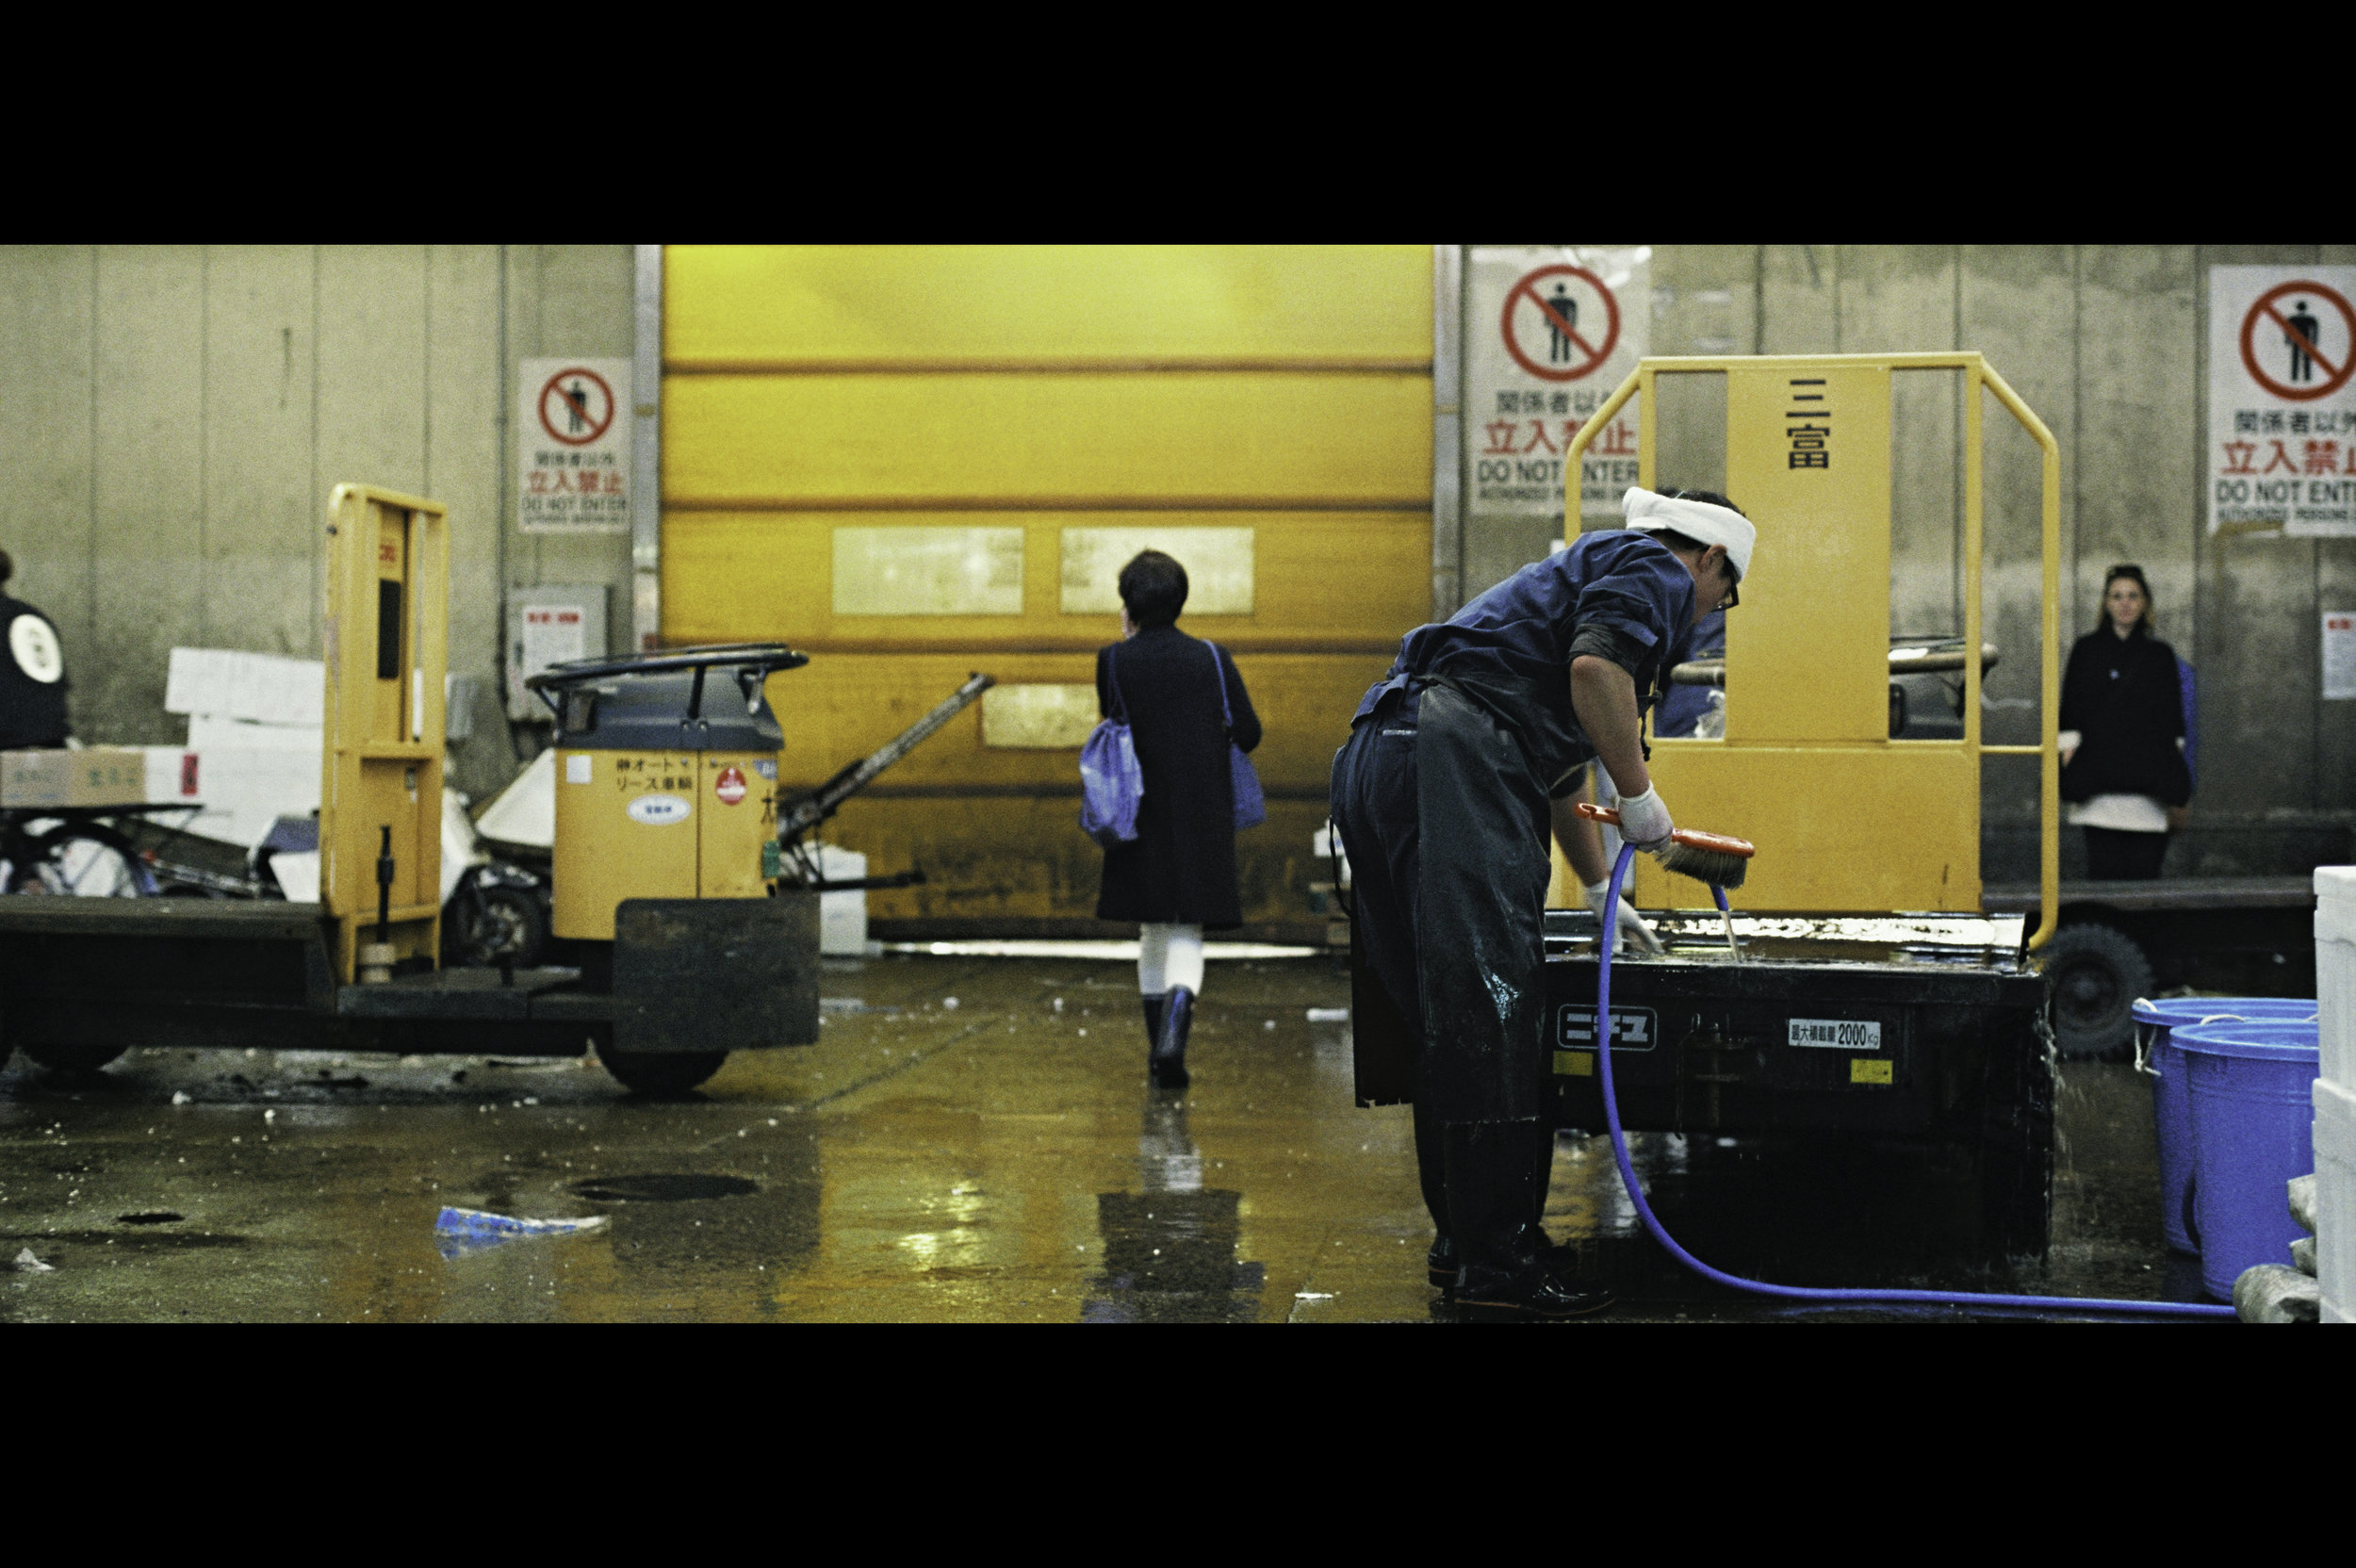 inside-tsukiji-vendor-cleaning-fish-trolley